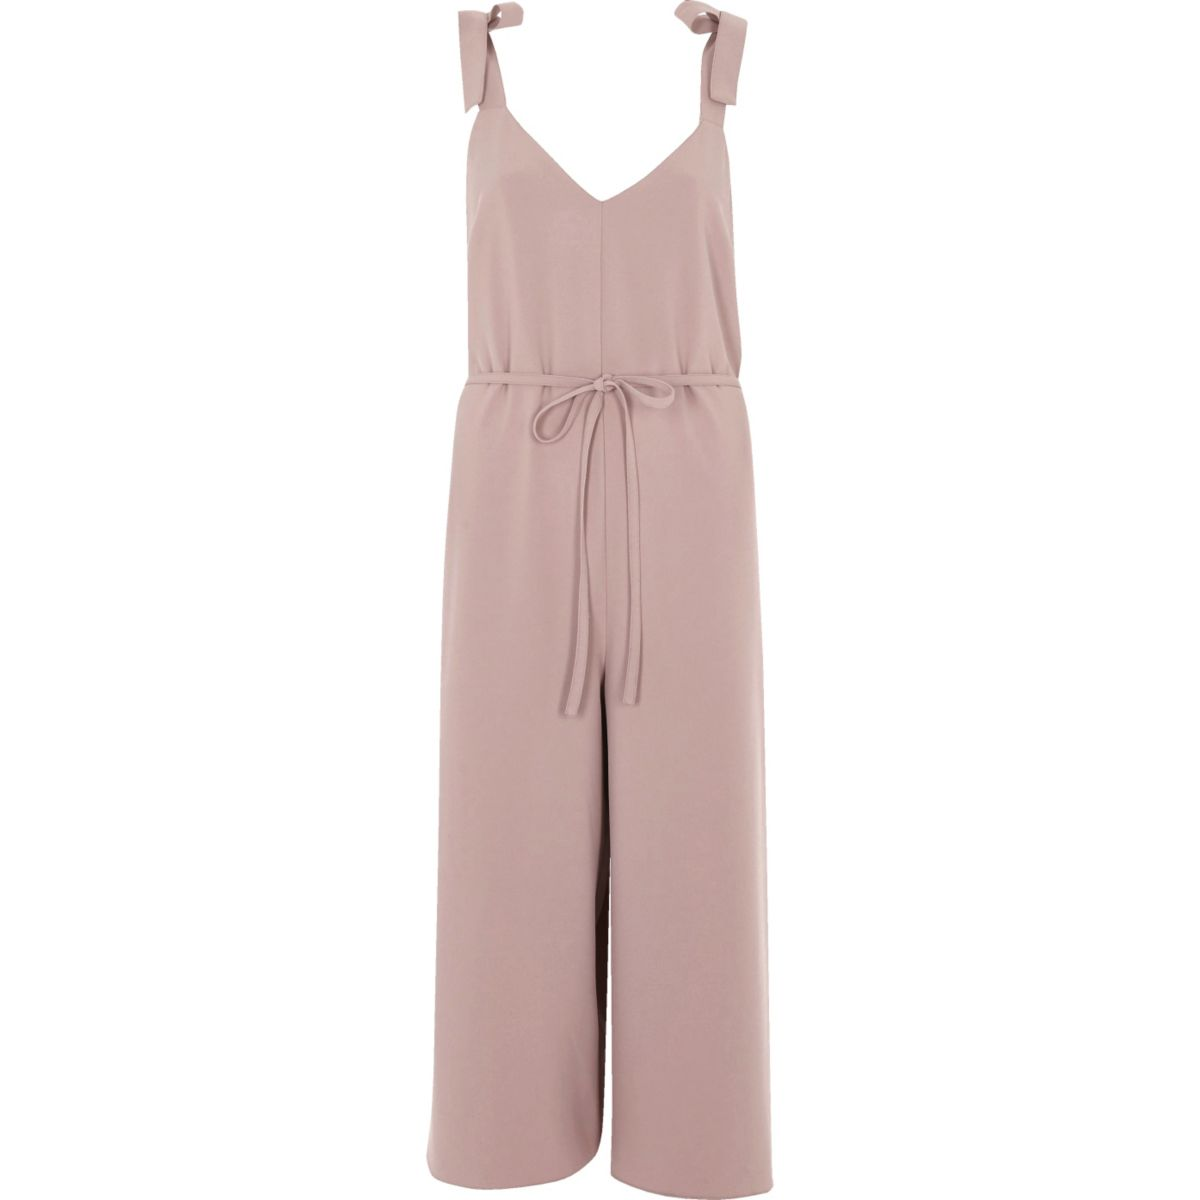 Combinaison jupe-culotte rose blush